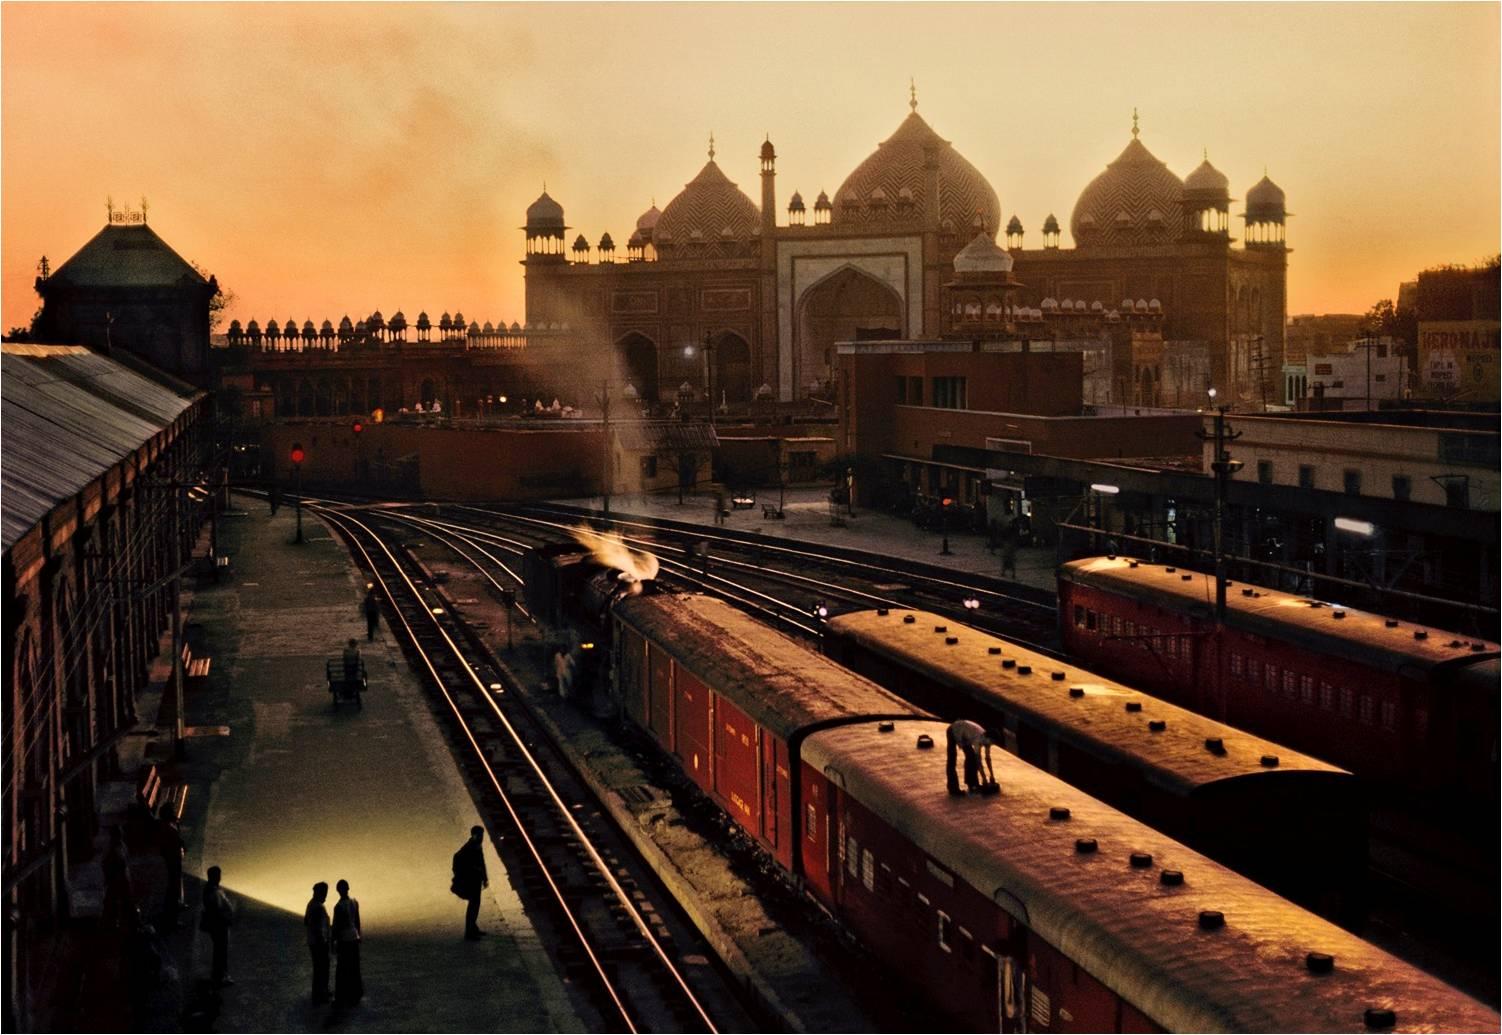 Agra Fort train station at dusk, 1983. (Photograph by Steve McCurry. Courtesy Phaidon/Roli Books)